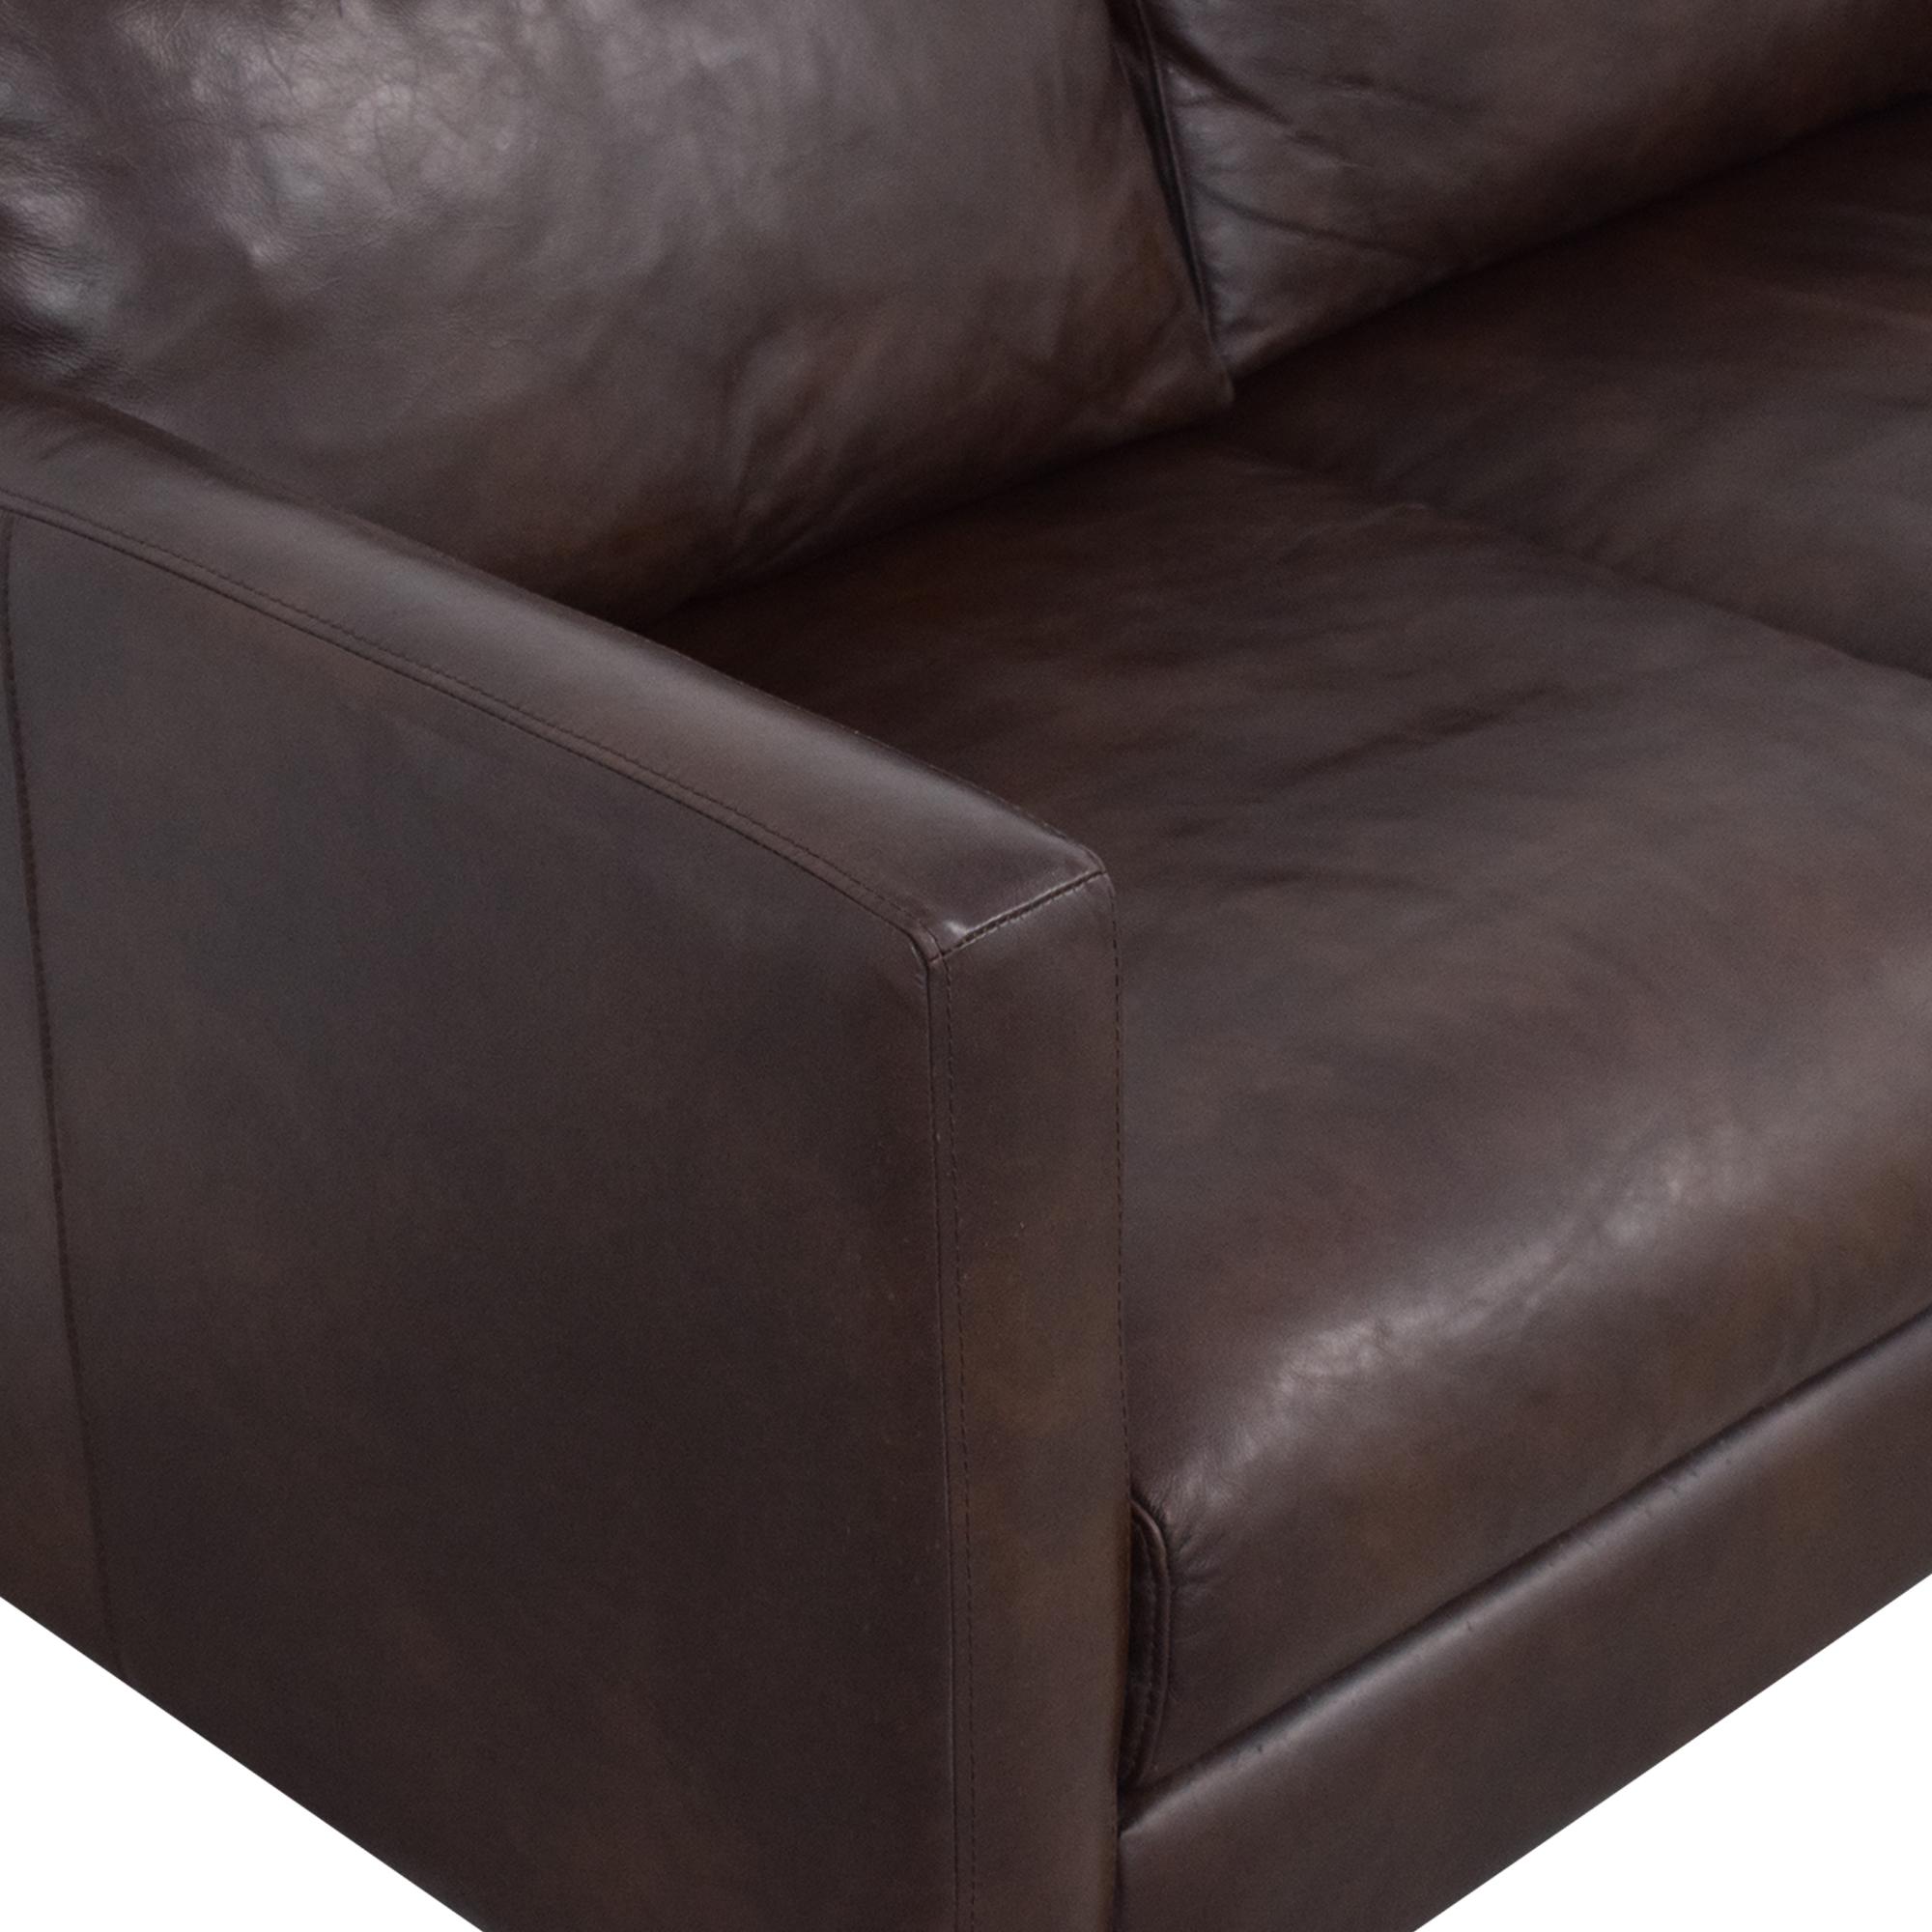 shop Strick & Bolton Strick & Bolton Beatnik Oxford Brown Leather Sofa online